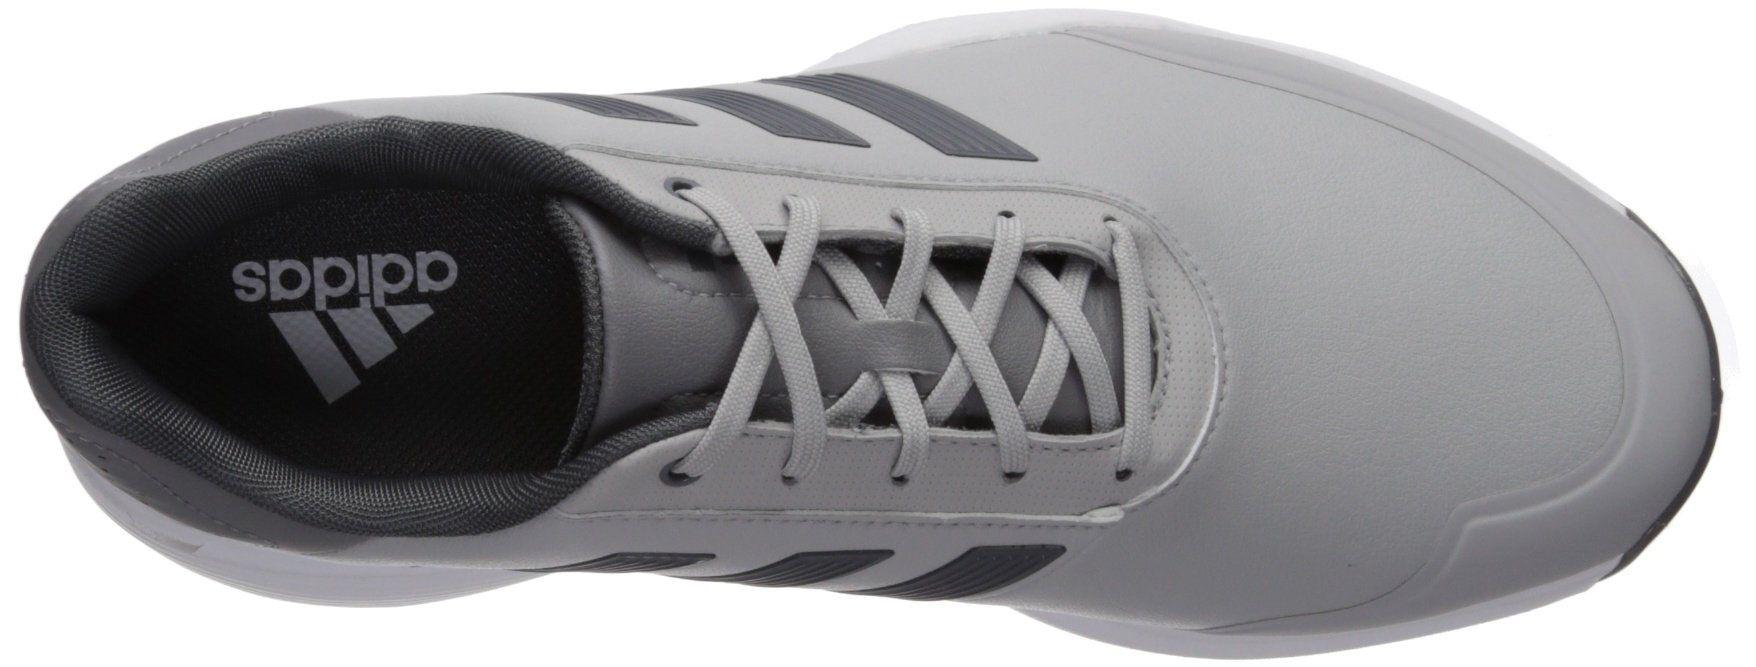 Adidas adiPower Bounce Men's Golf Shoes